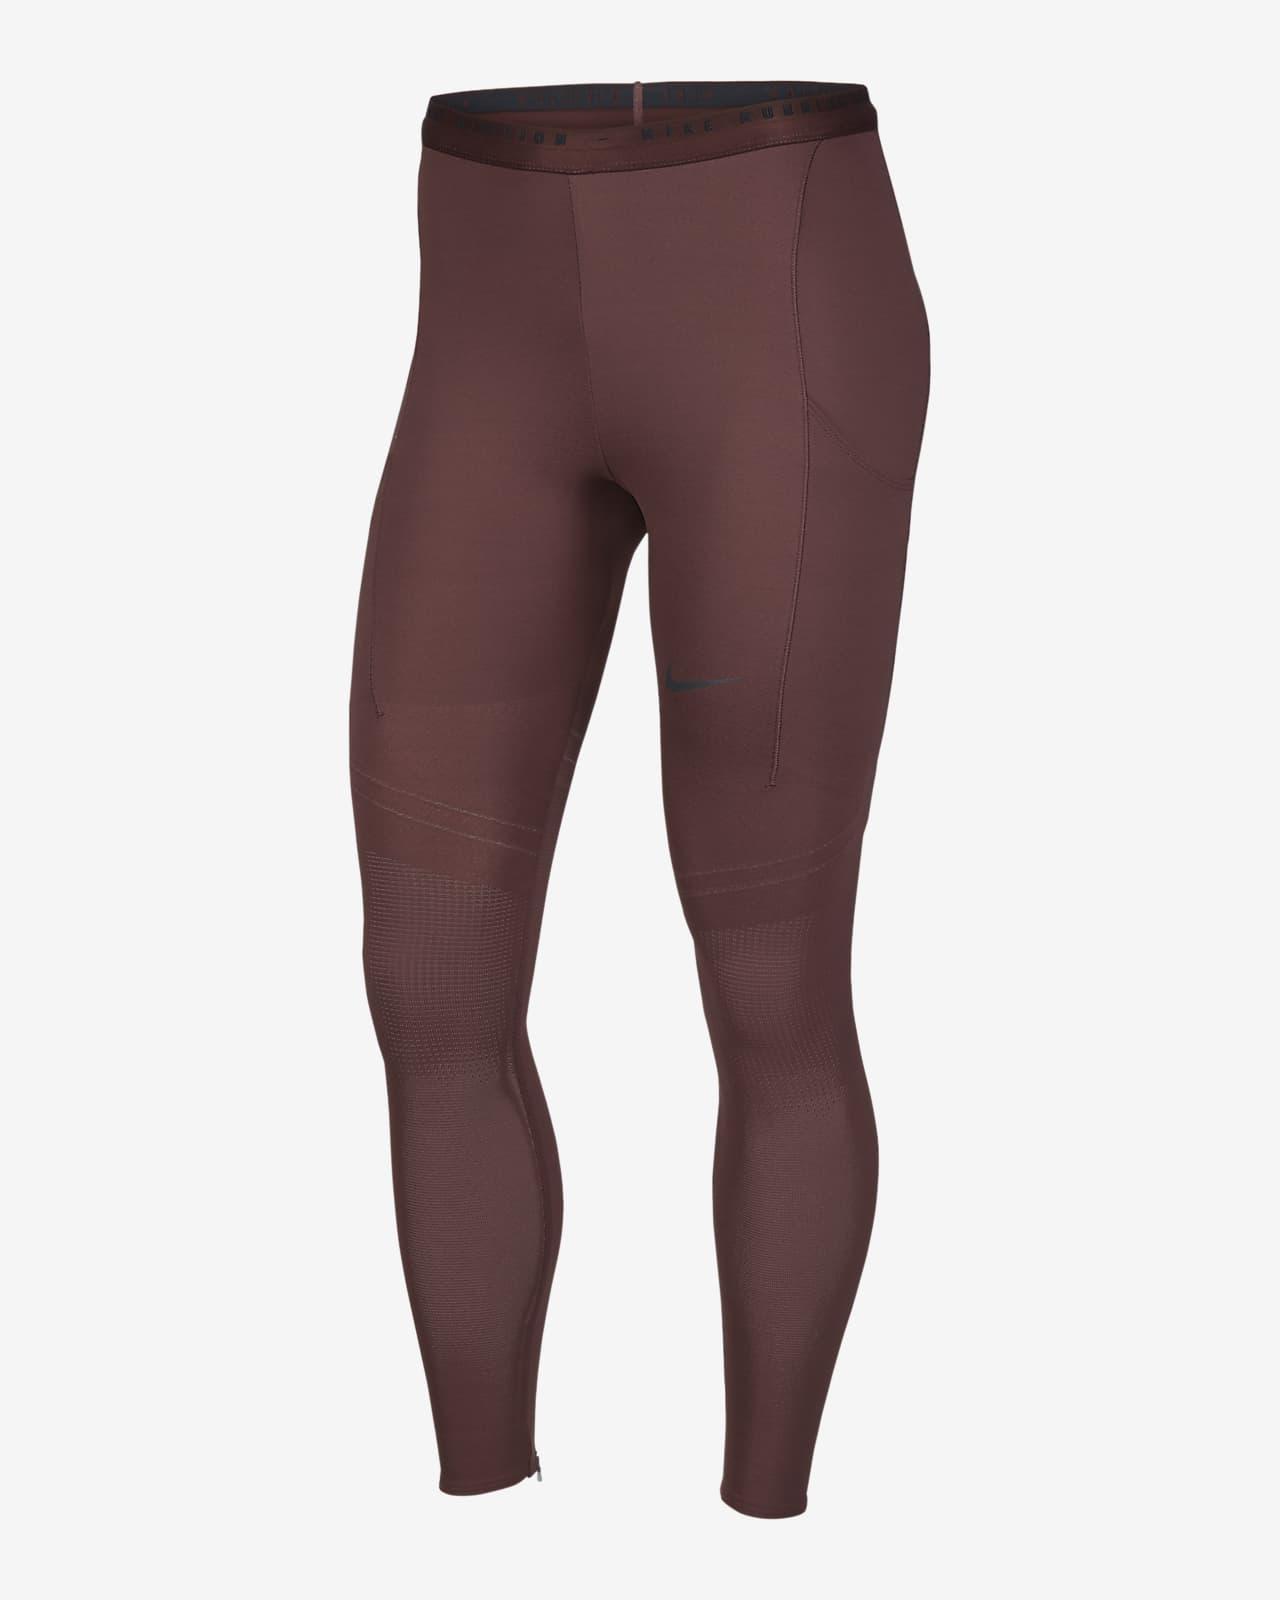 Nike Dri-FIT ADV Run Division Epic Luxe 女款中腰機能跑步內搭褲